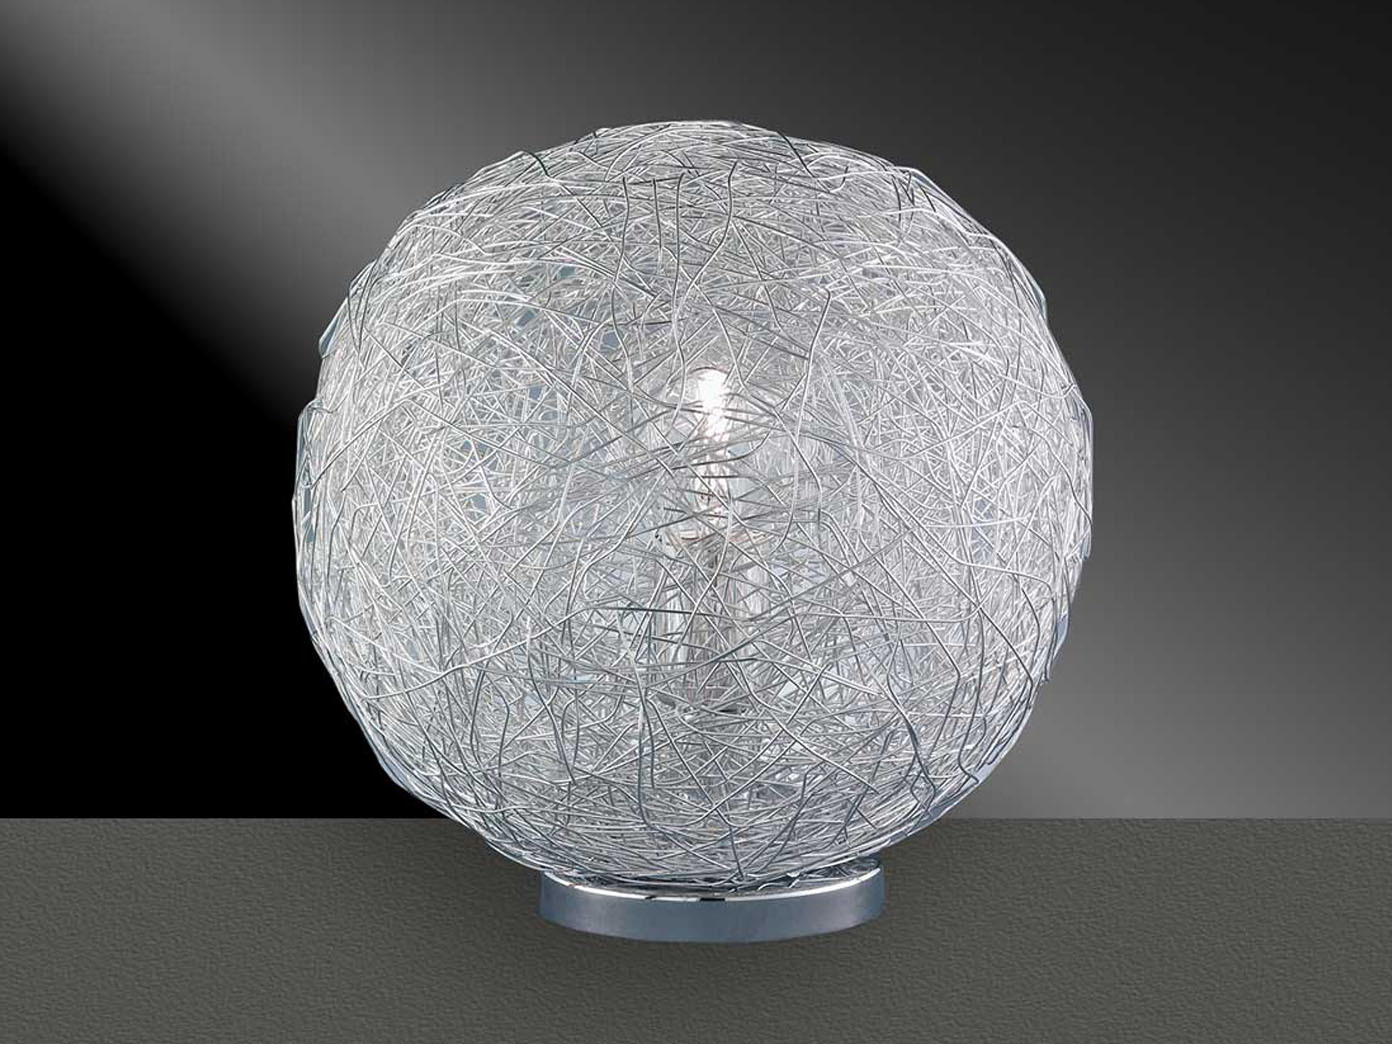 Kugelförmige Tischlampe 30cm Chrom, Drahtgeflecht, Action by Wofi | eBay